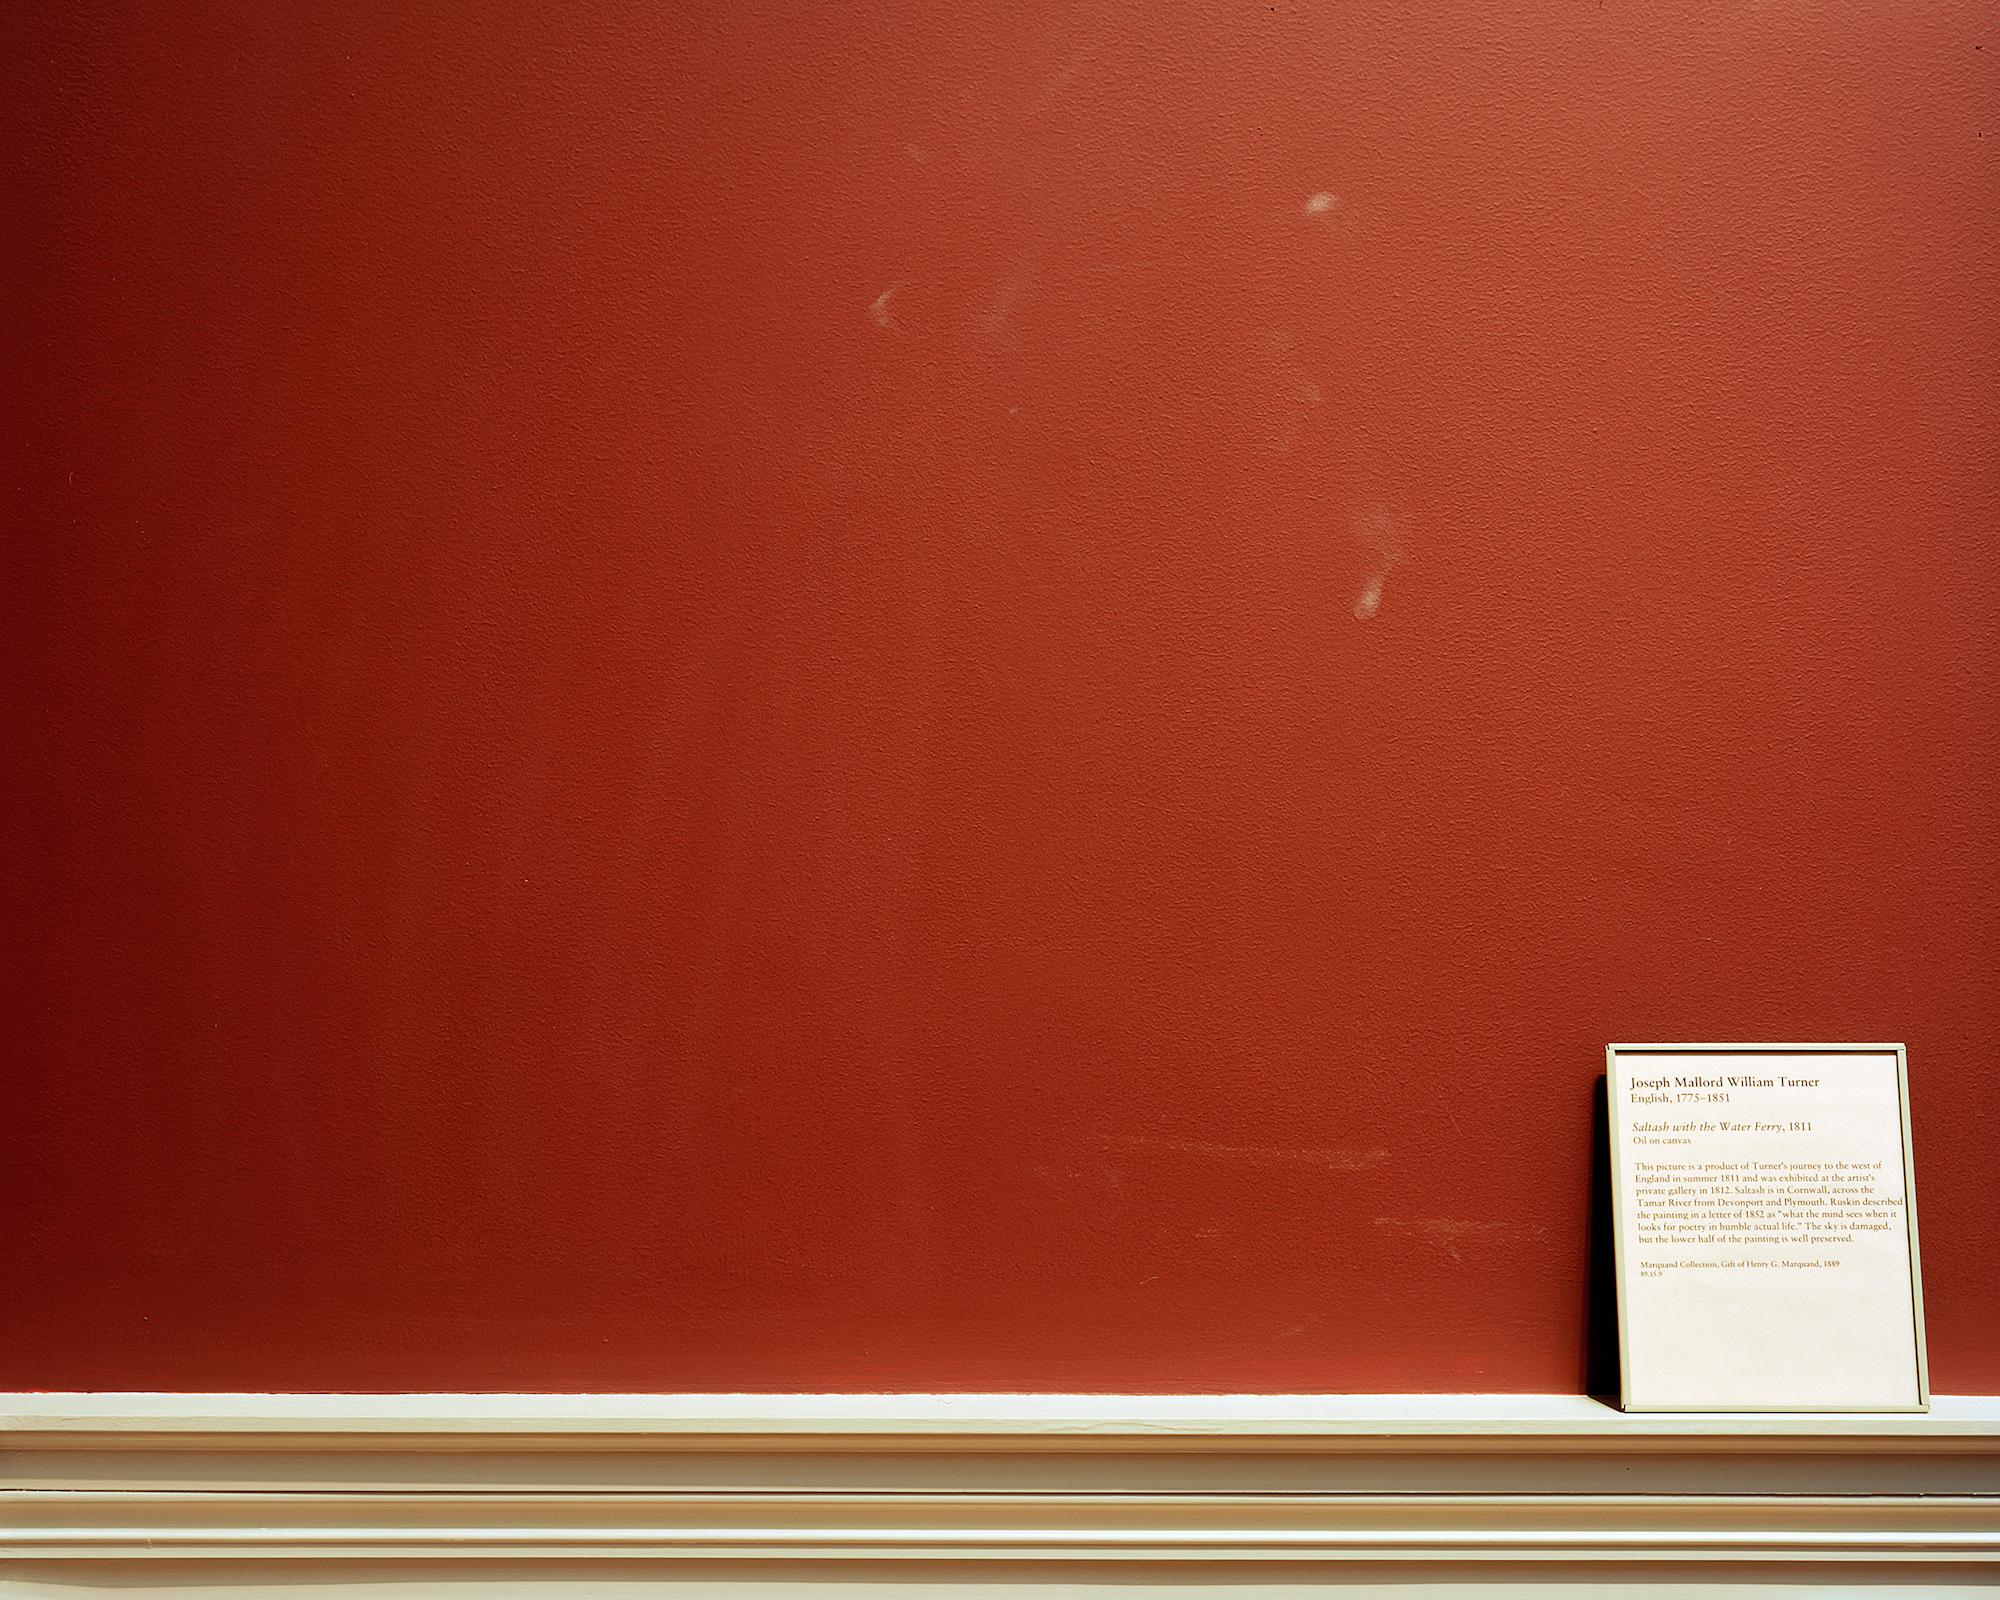 The Metropolitan Museum of Art-1, archival pigment print,11 x 14 inches, 2013